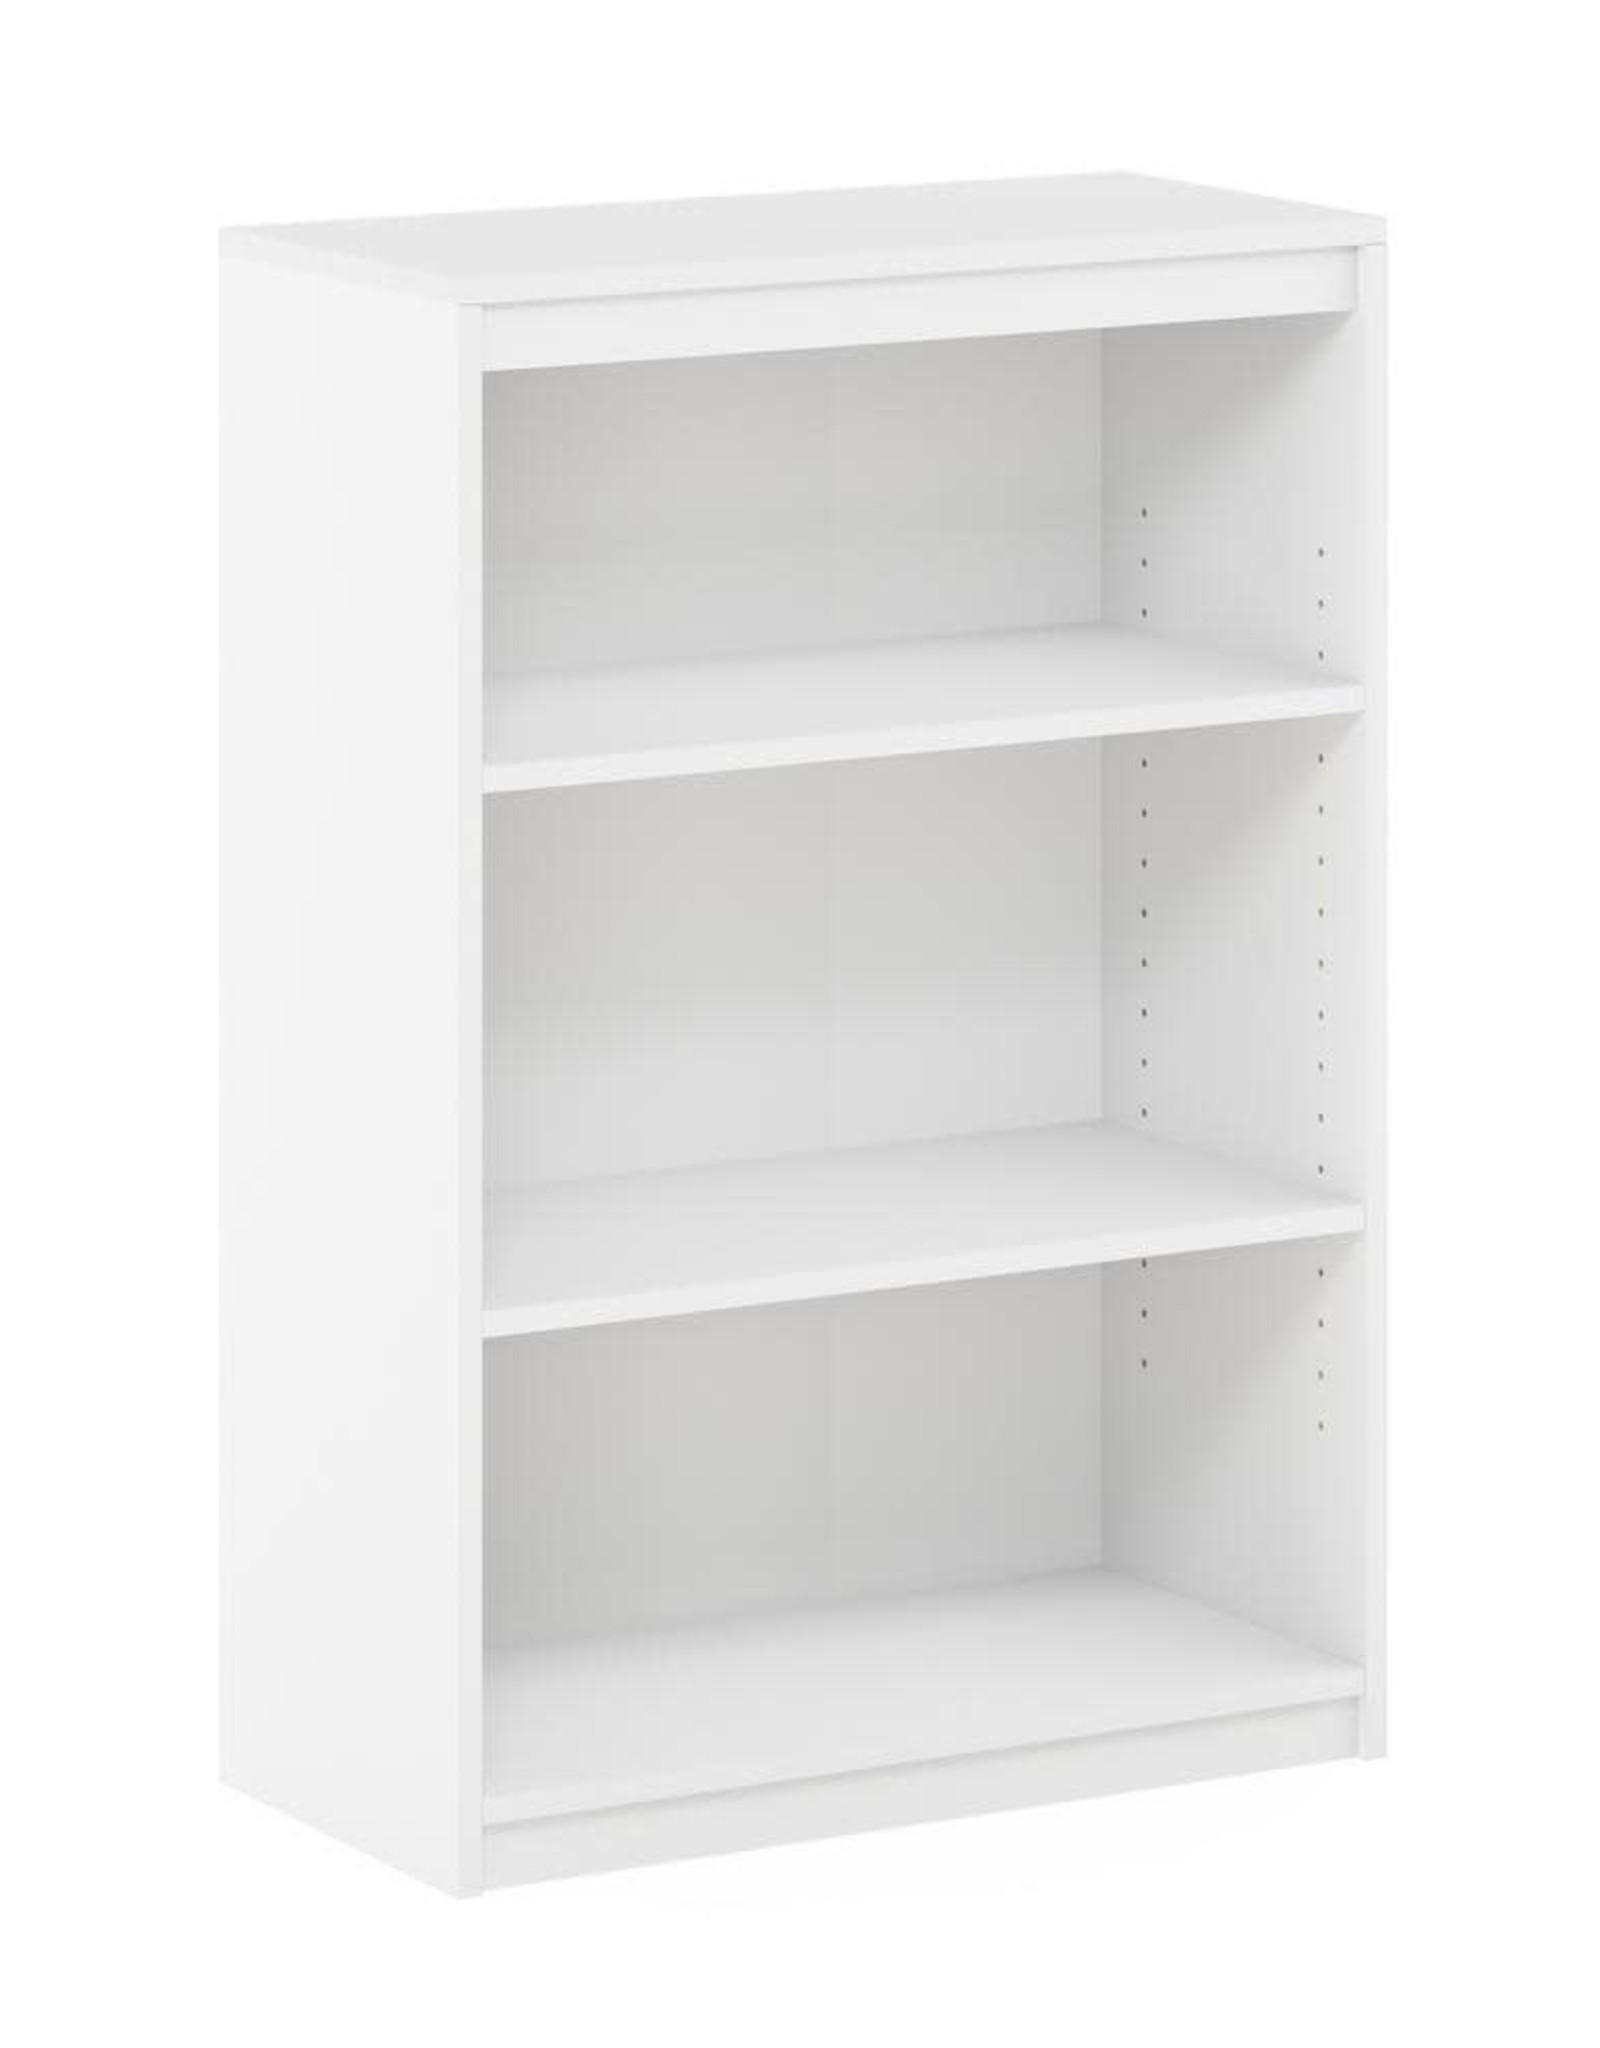 Furino Gruen 35.9 in. White 3-Shelf Standard Bookcase with Adjustable Shelves